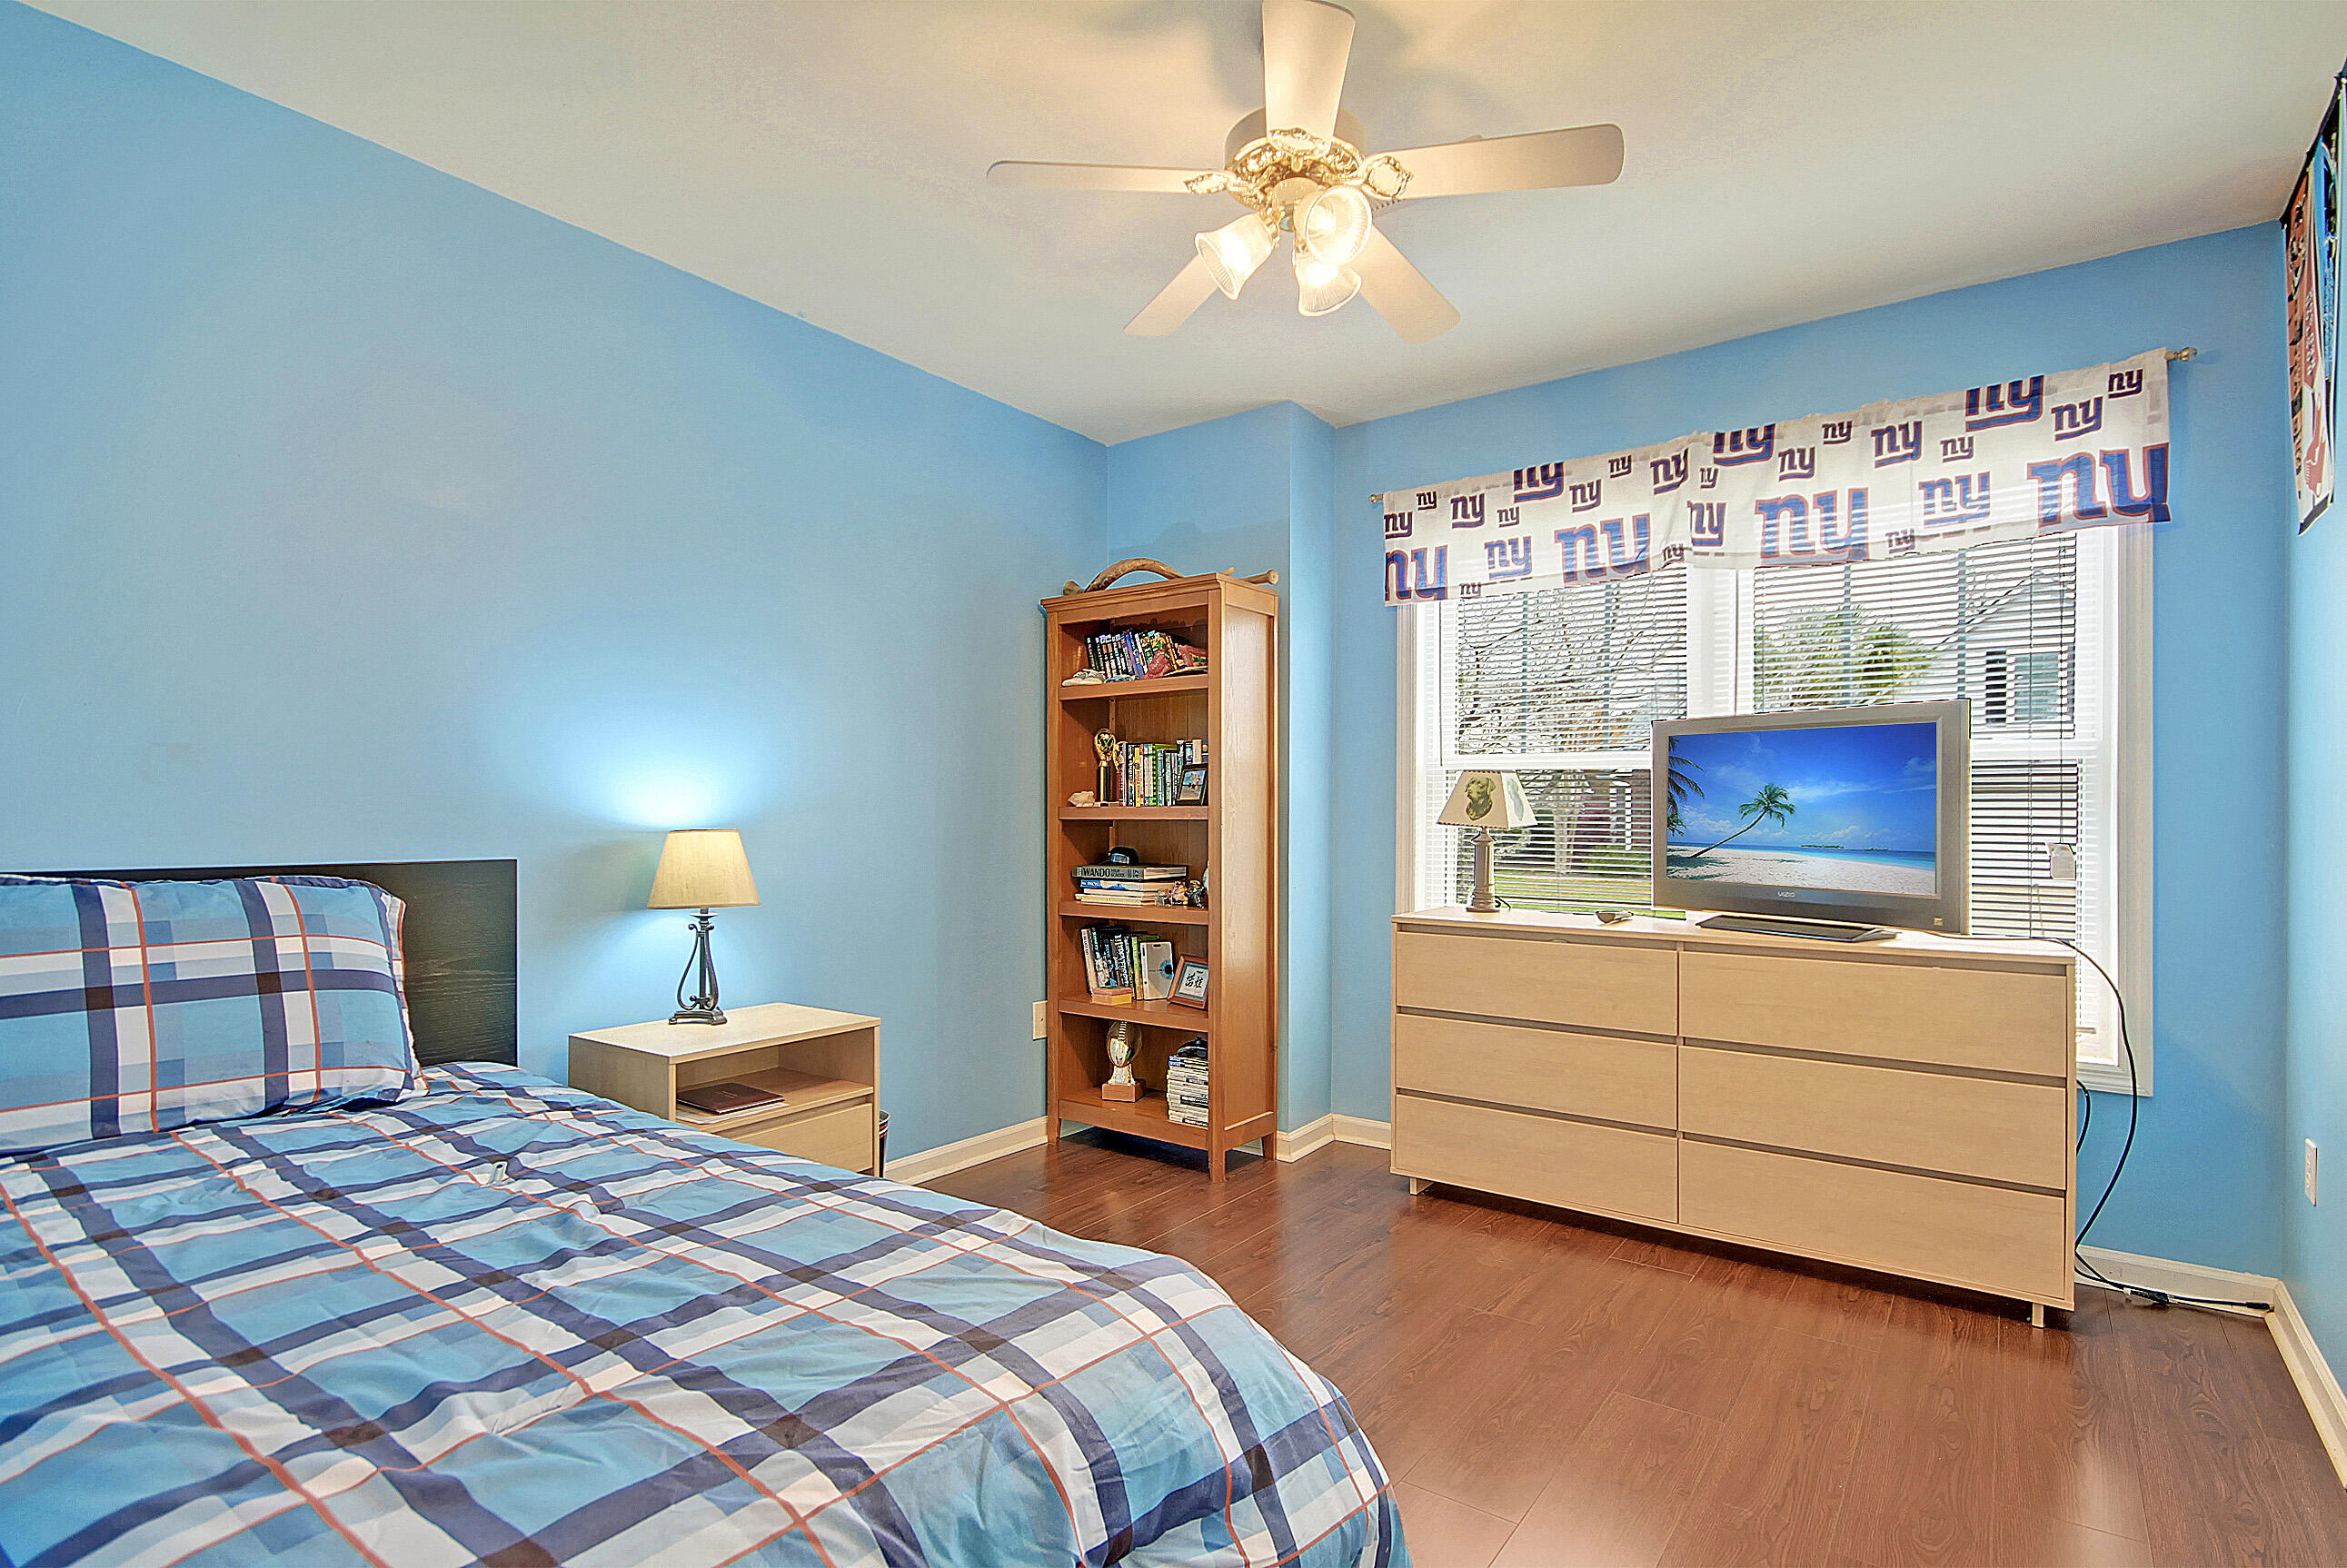 Park West Homes For Sale - 1460 Wellesley, Mount Pleasant, SC - 32